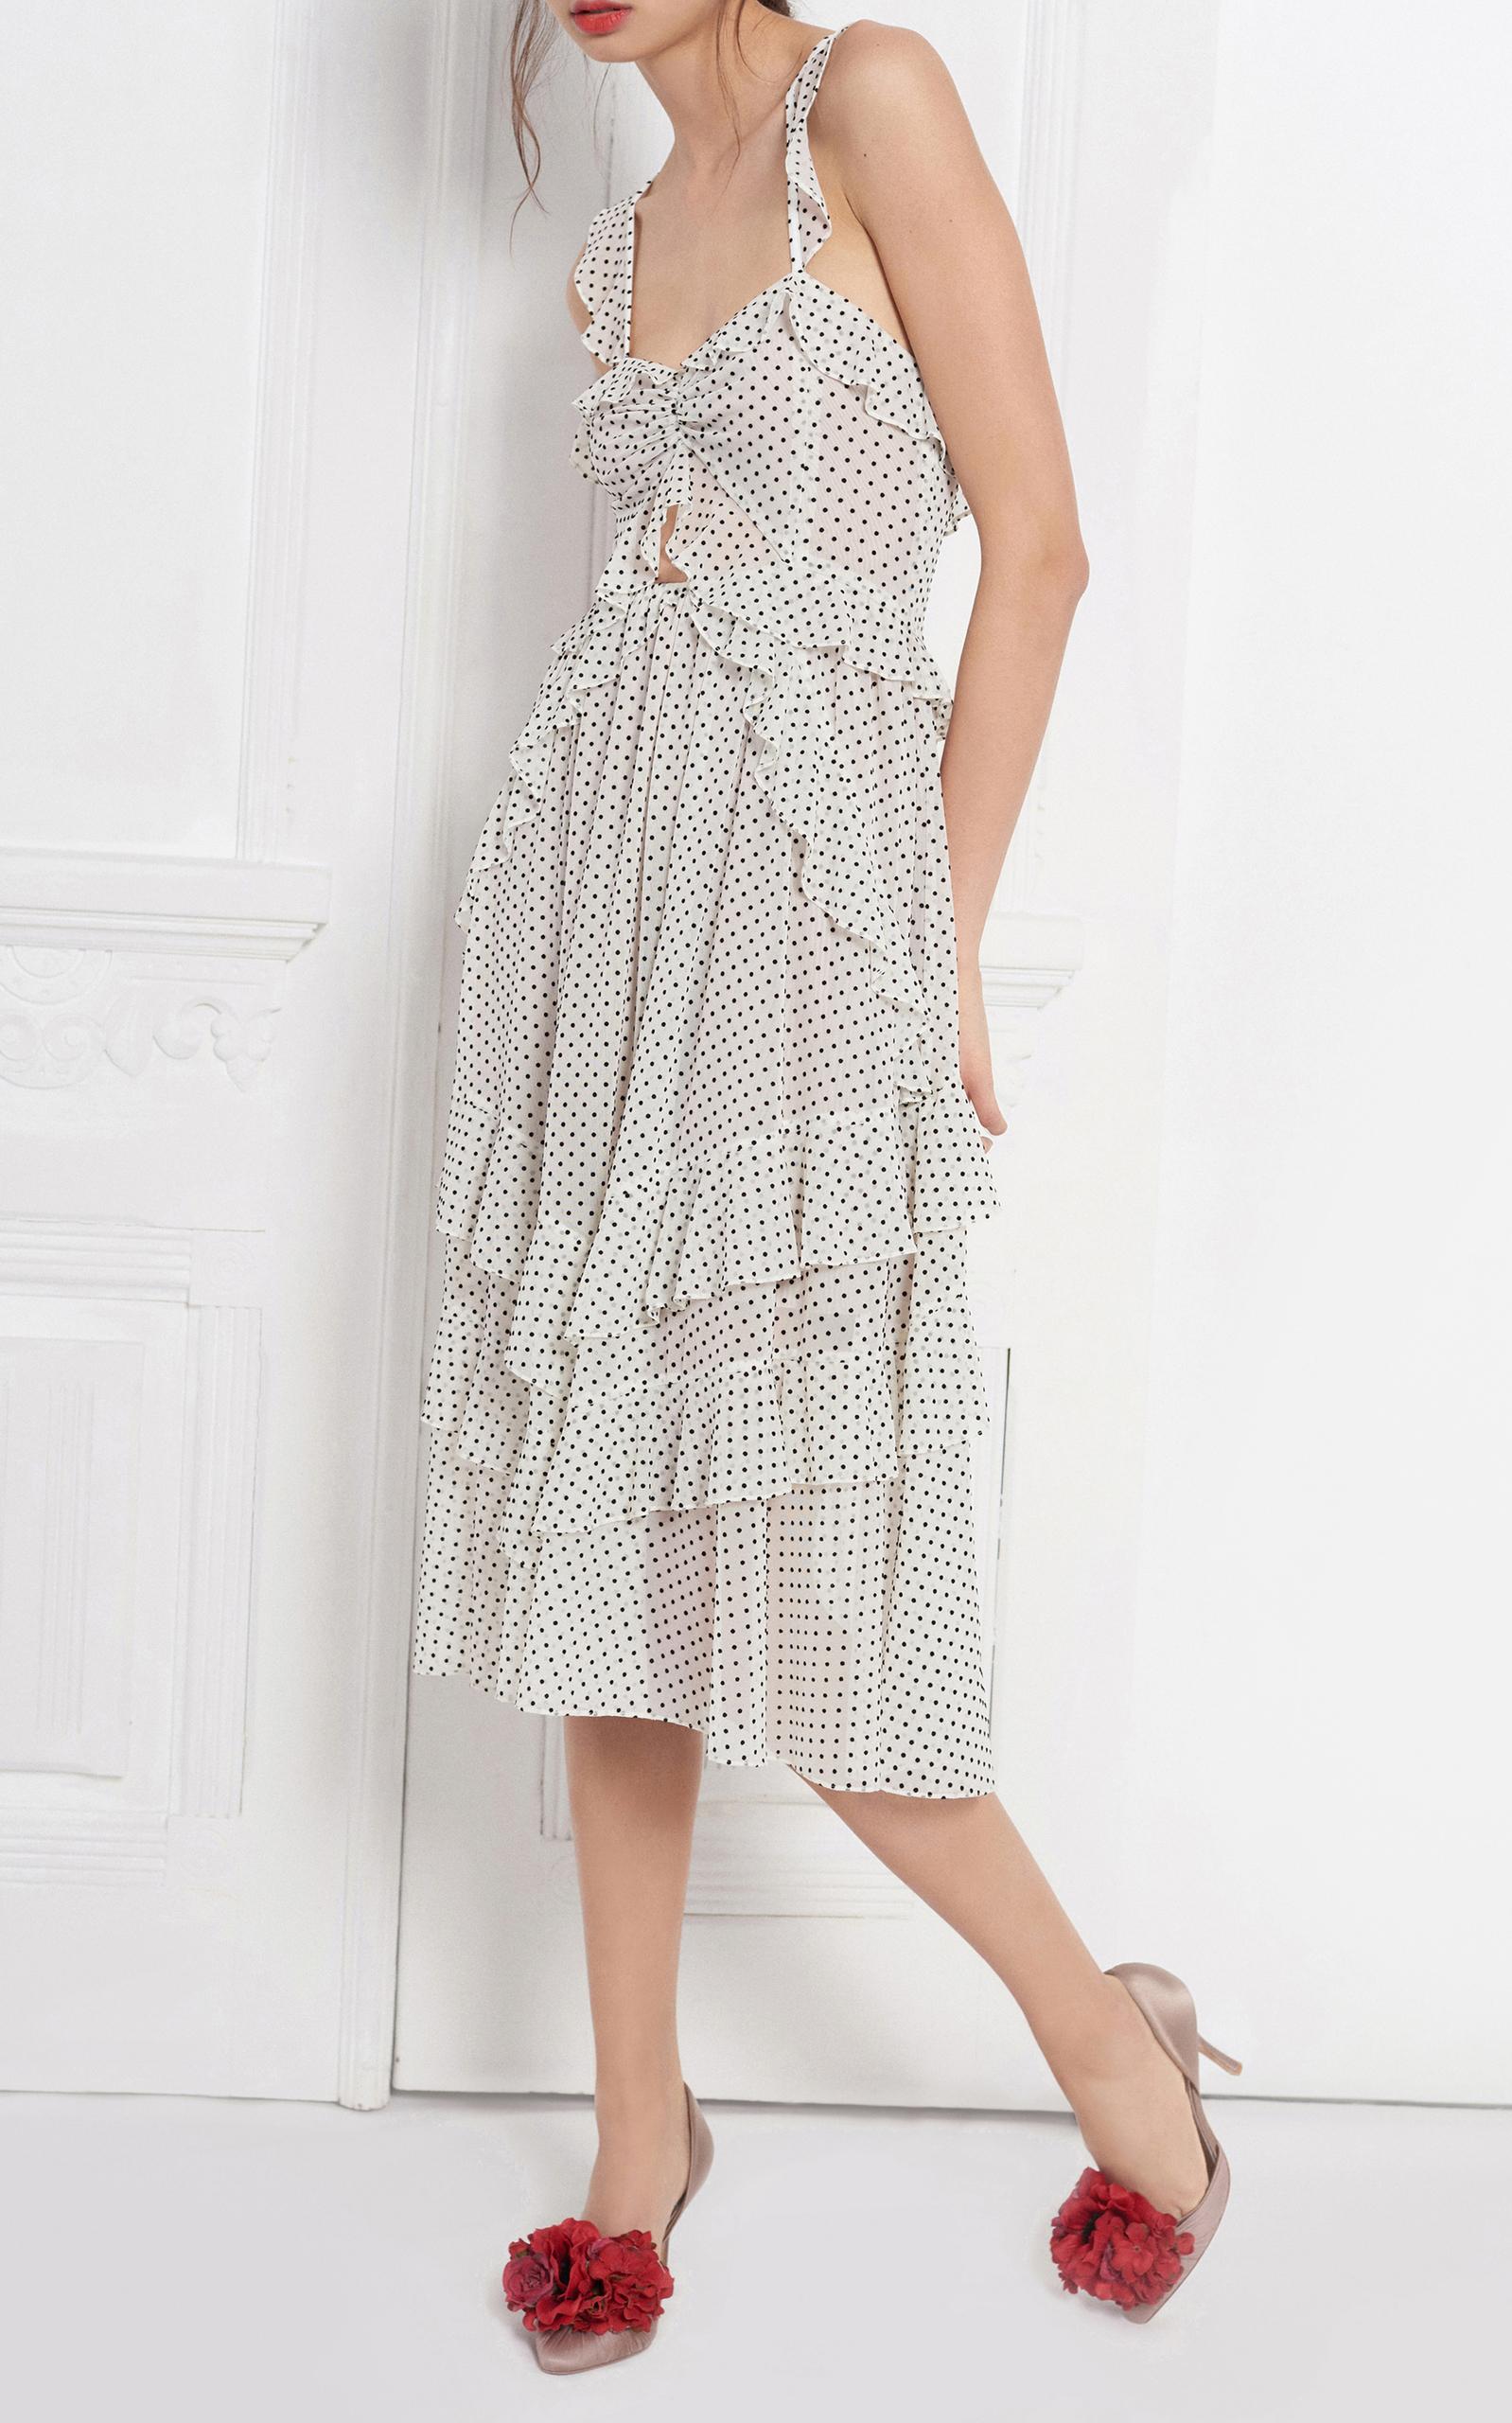 c691aed463 Marissa WebbKenzie Ruffle Midi Dress. CLOSE. Loading. Loading. Loading